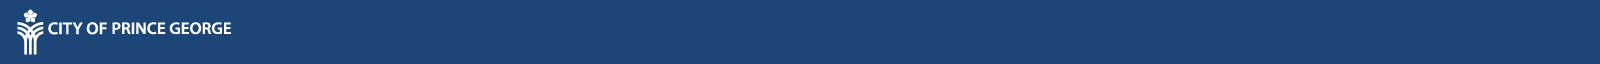 Prince George, BC logo